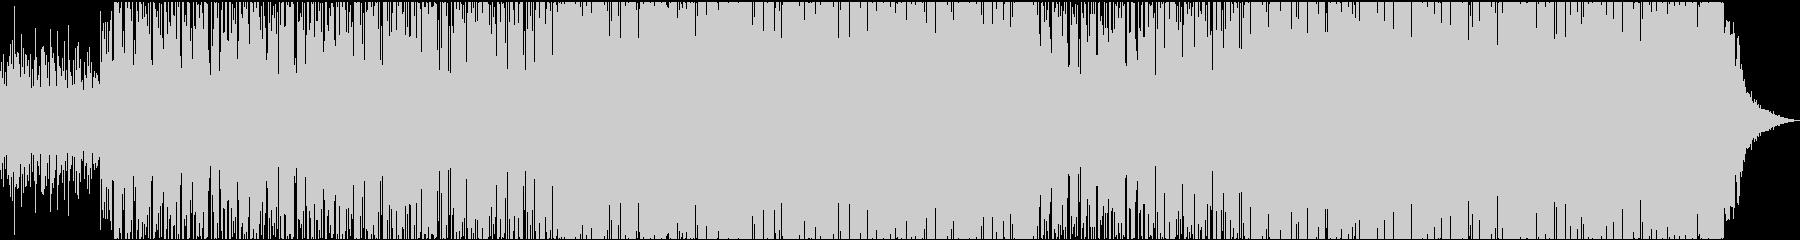 Chill & Downtempoの未再生の波形